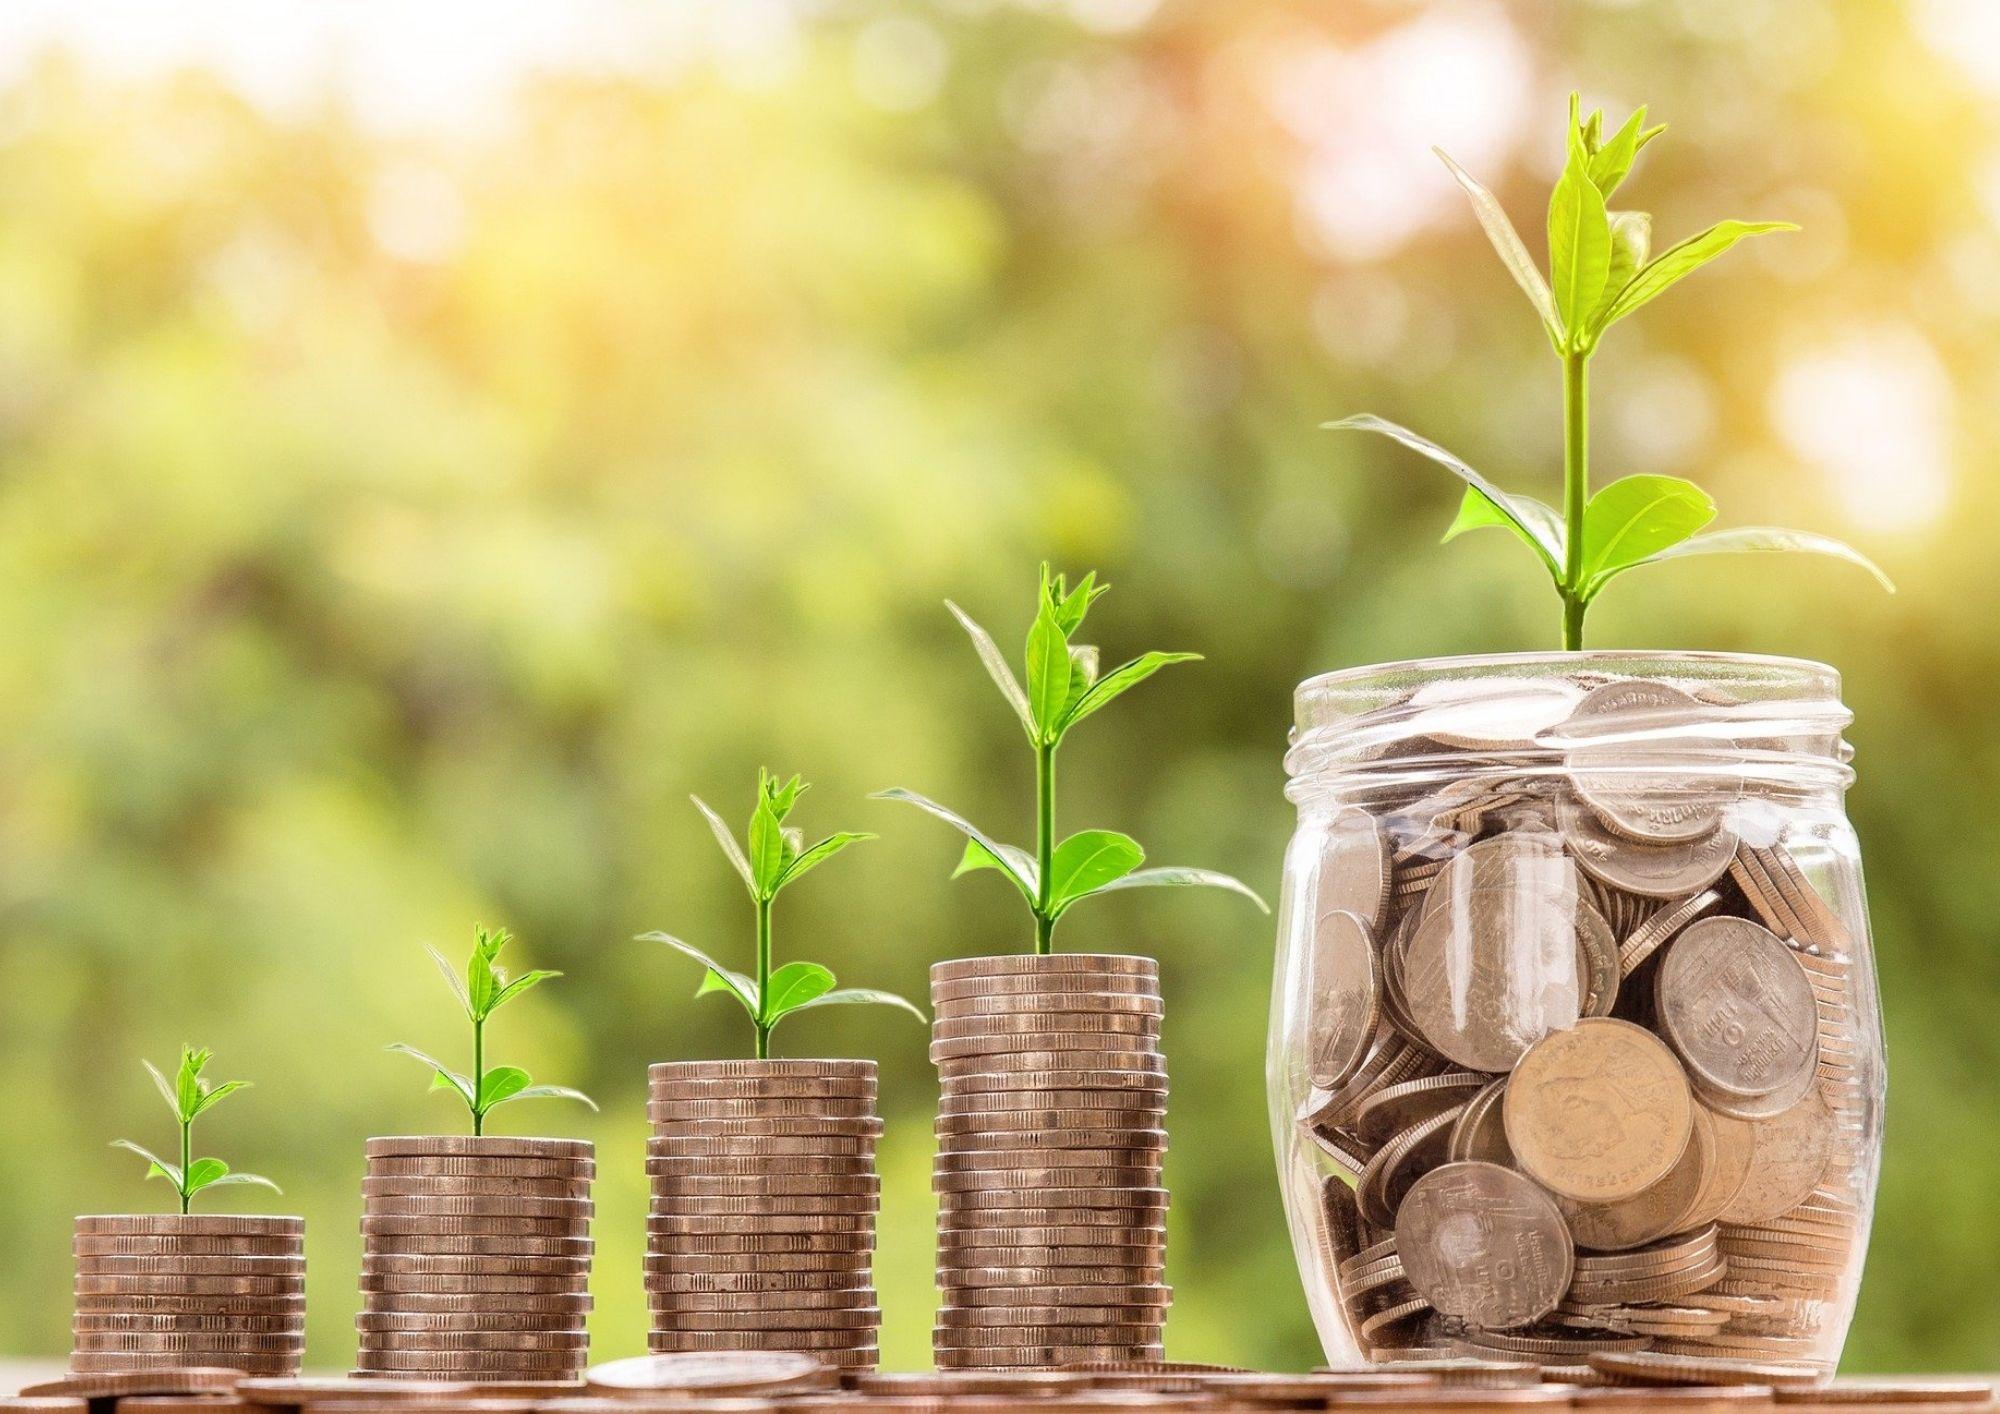 Fundraising: recauda fondos para tus producciones